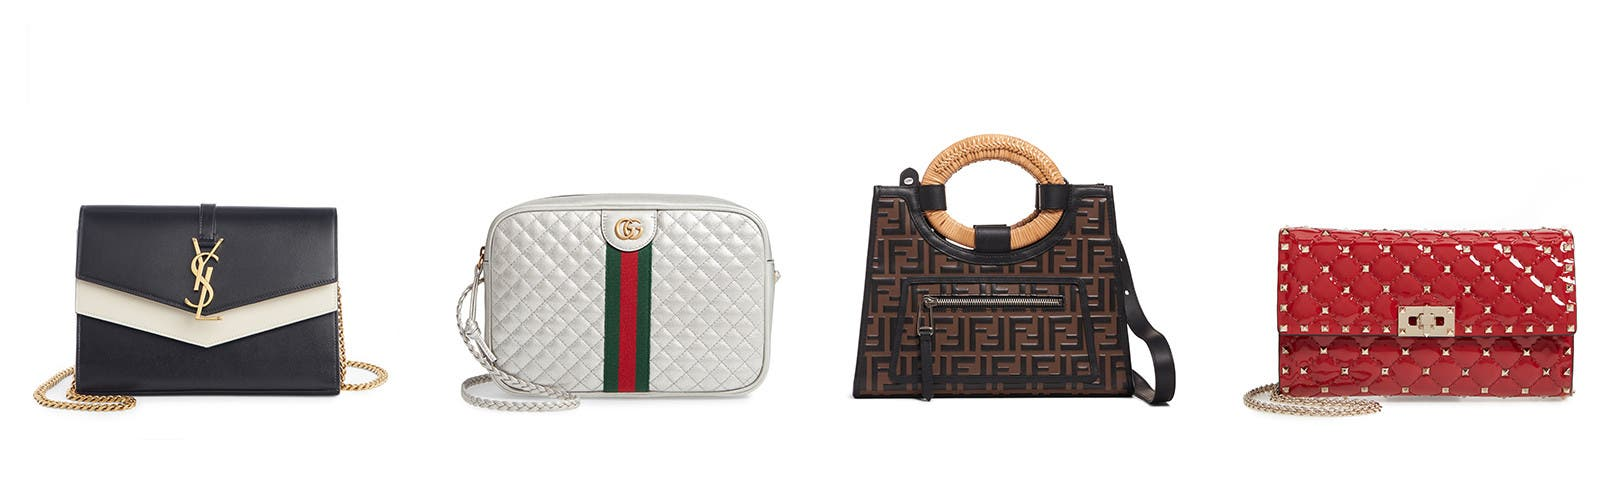 Women s Designer Handbags   Wallets   Nordstrom 18a2ed245e